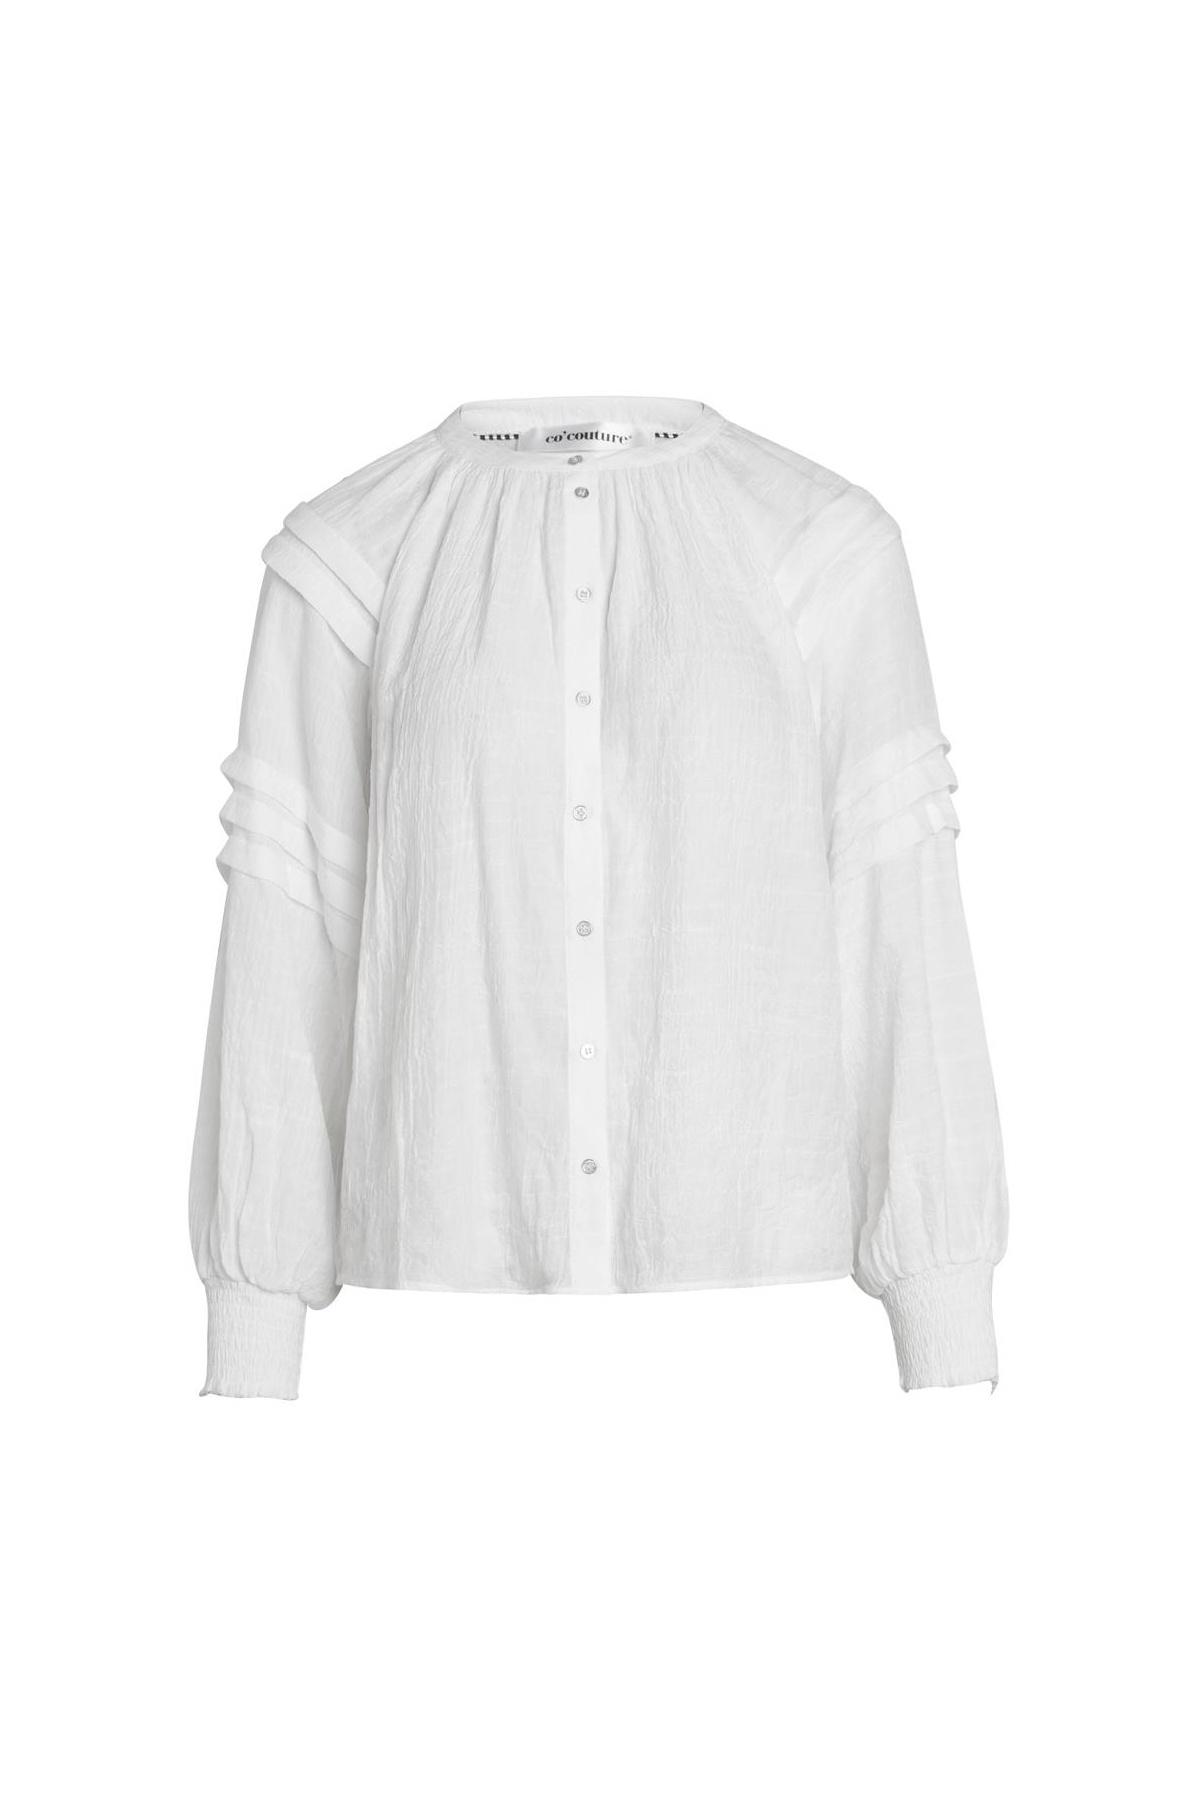 Cora Pleat Shirt - Off White-1